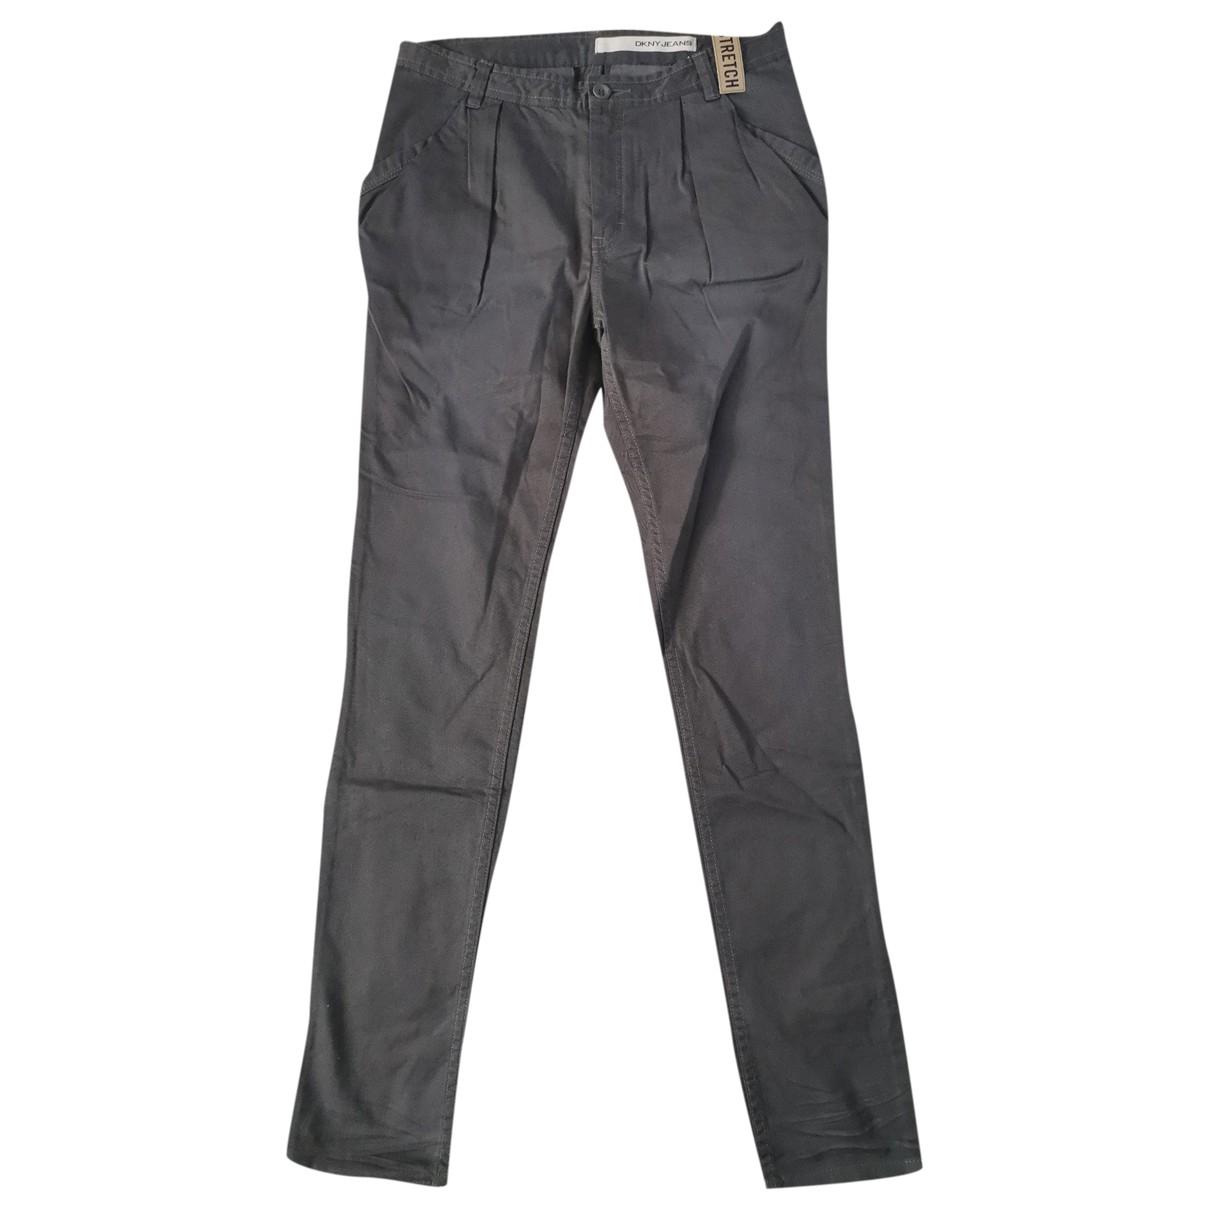 Dkny \N Khaki Cotton Trousers for Women 8 UK